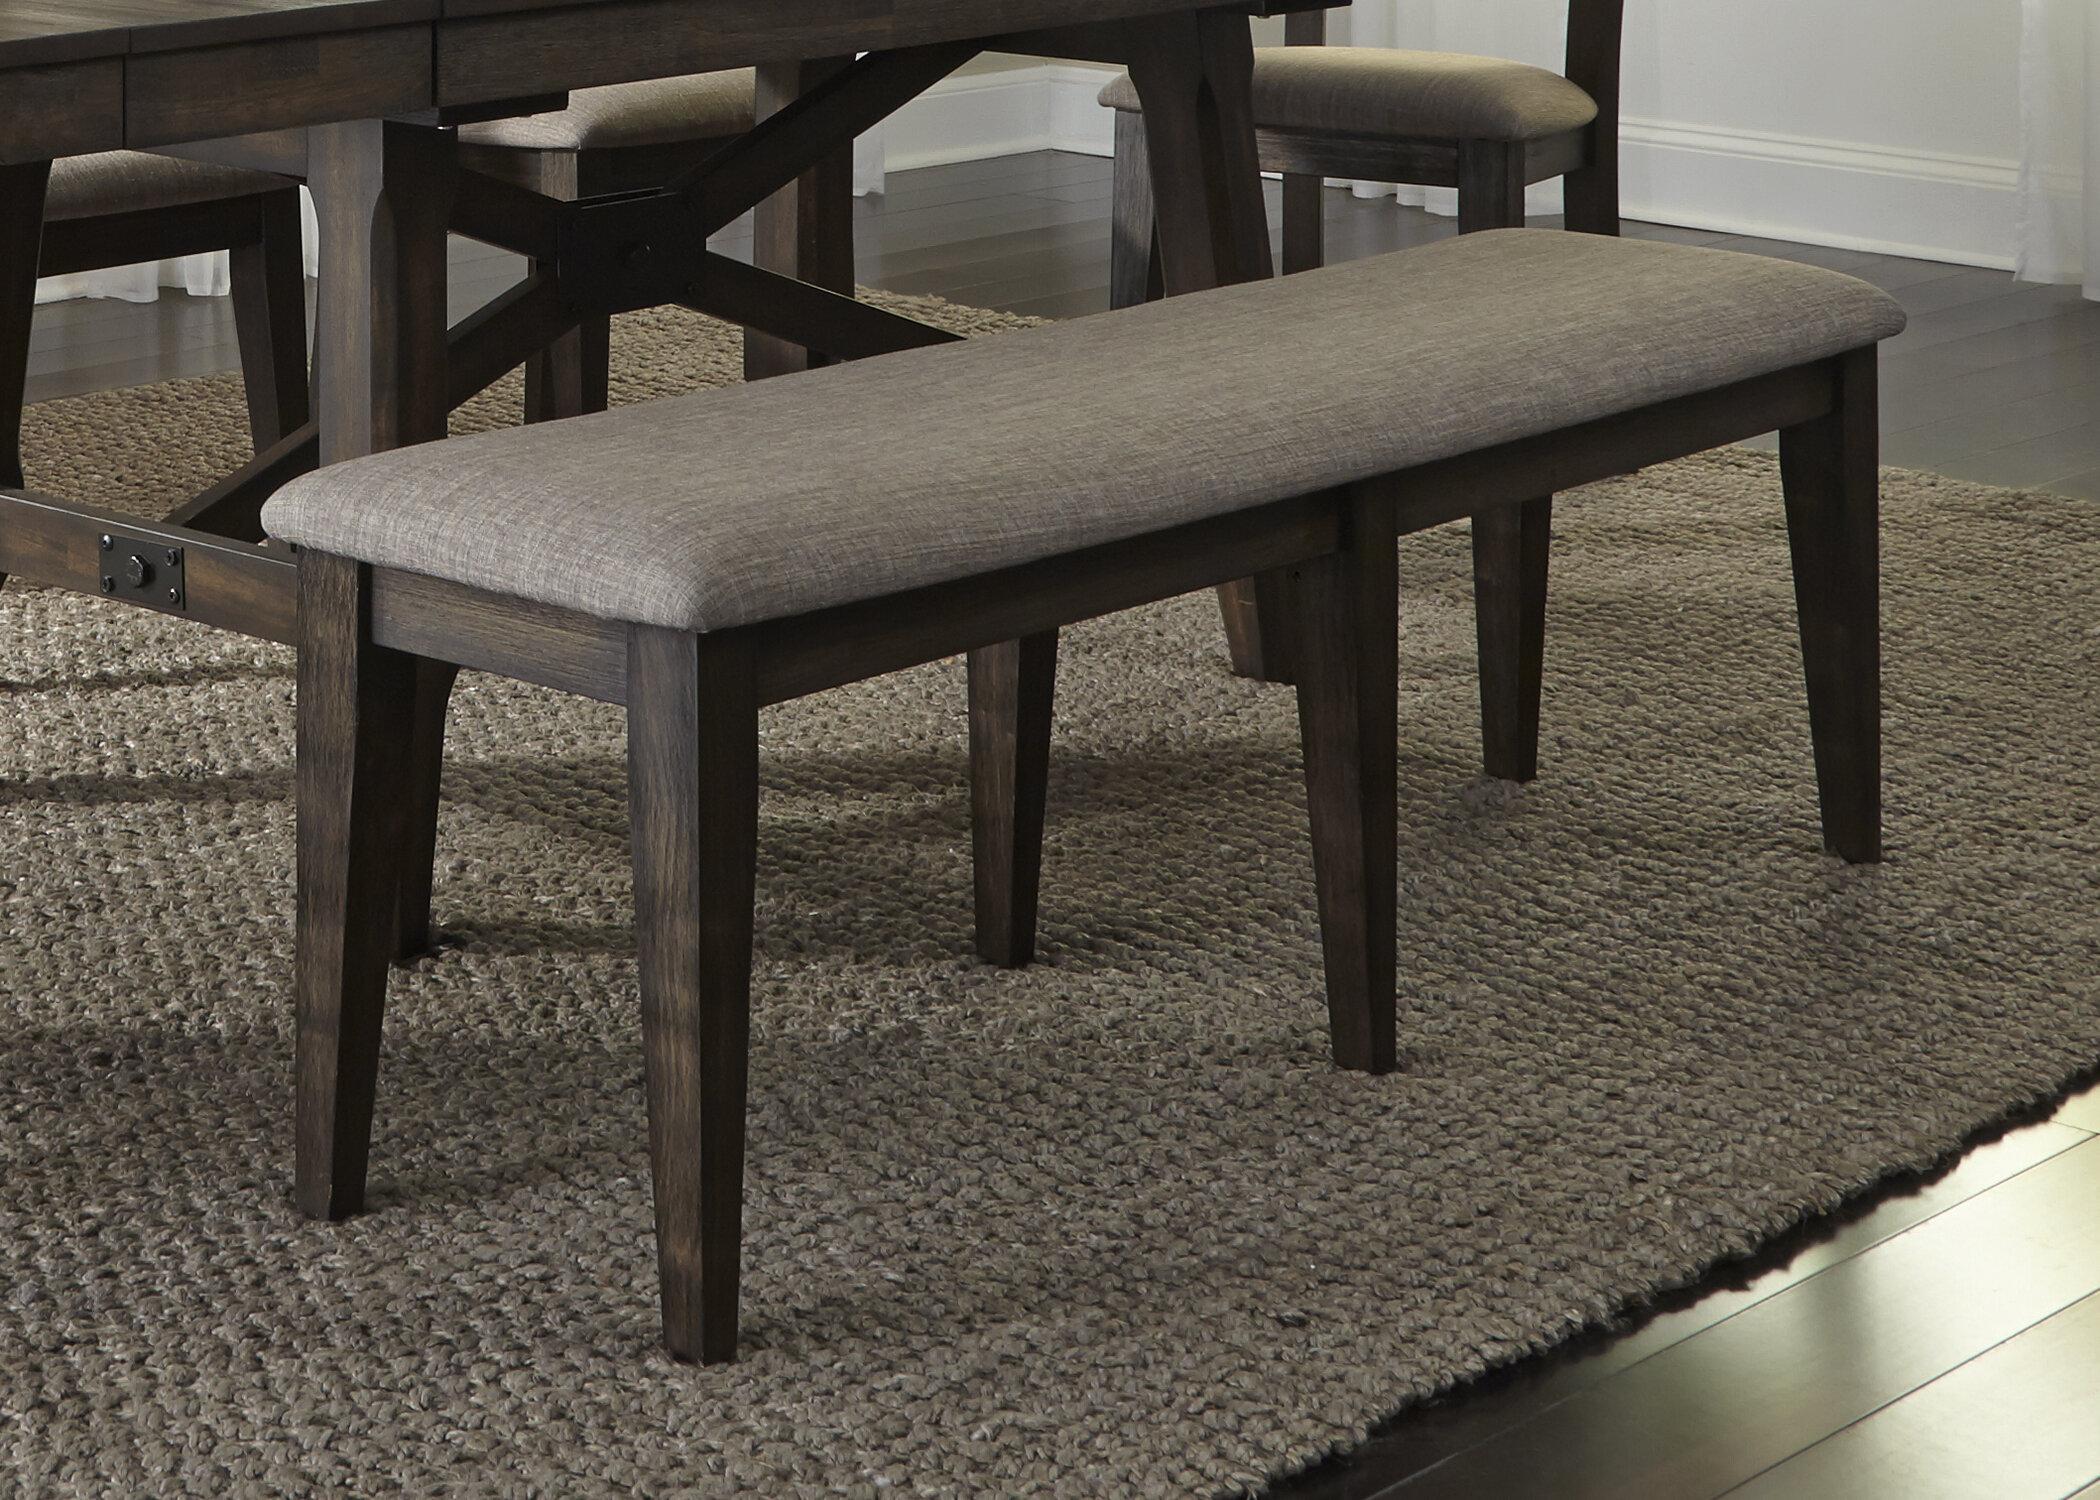 Tremendous Walton Wood Bedroom Bench Machost Co Dining Chair Design Ideas Machostcouk